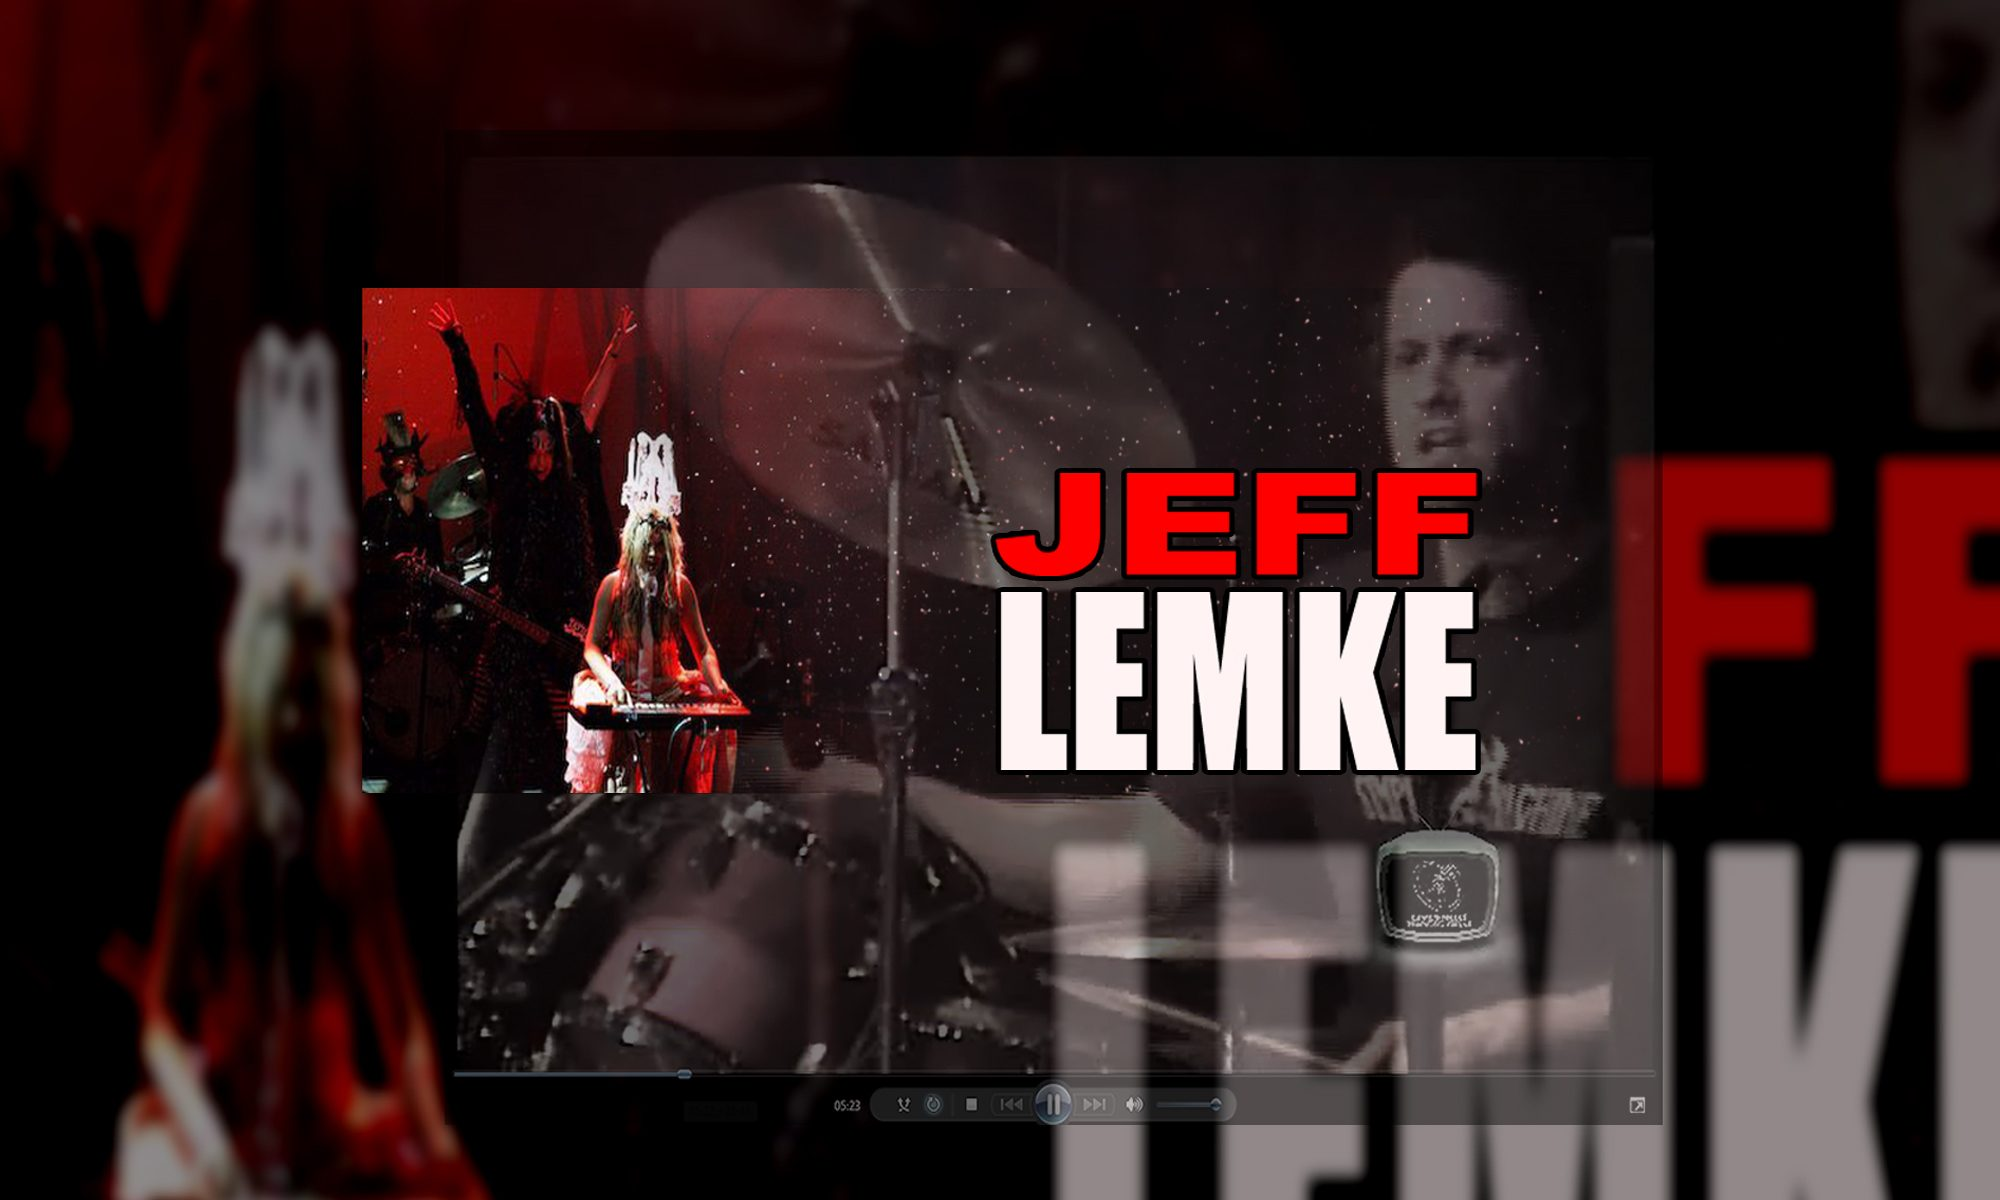 Jeff Lemke